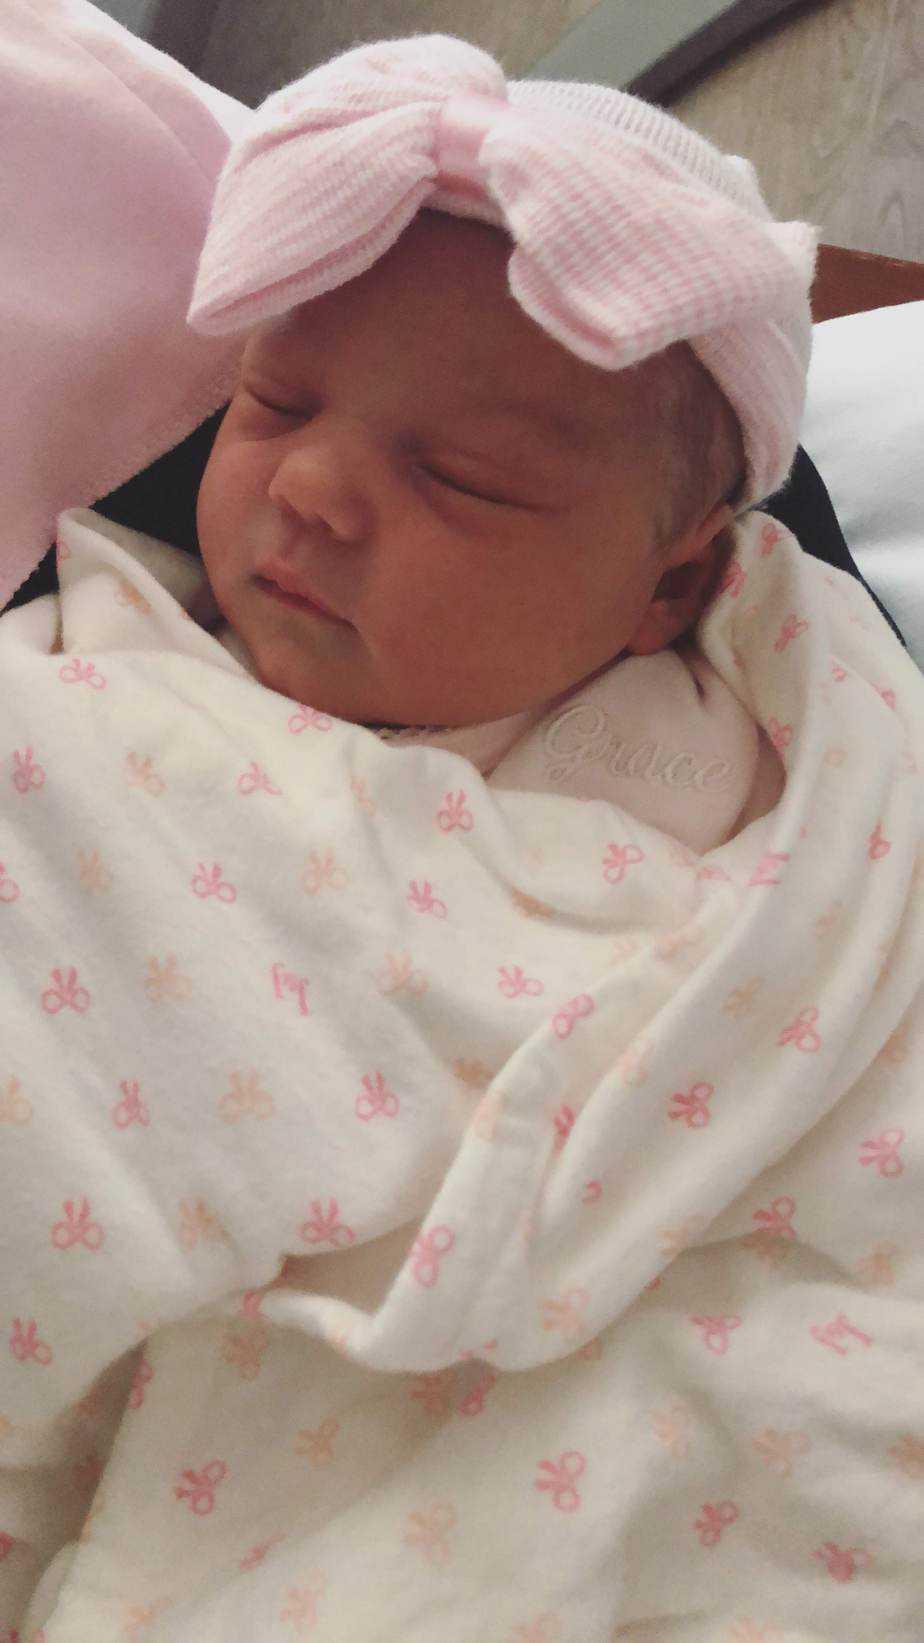 An epidural free, 40 minute labor, birth story!